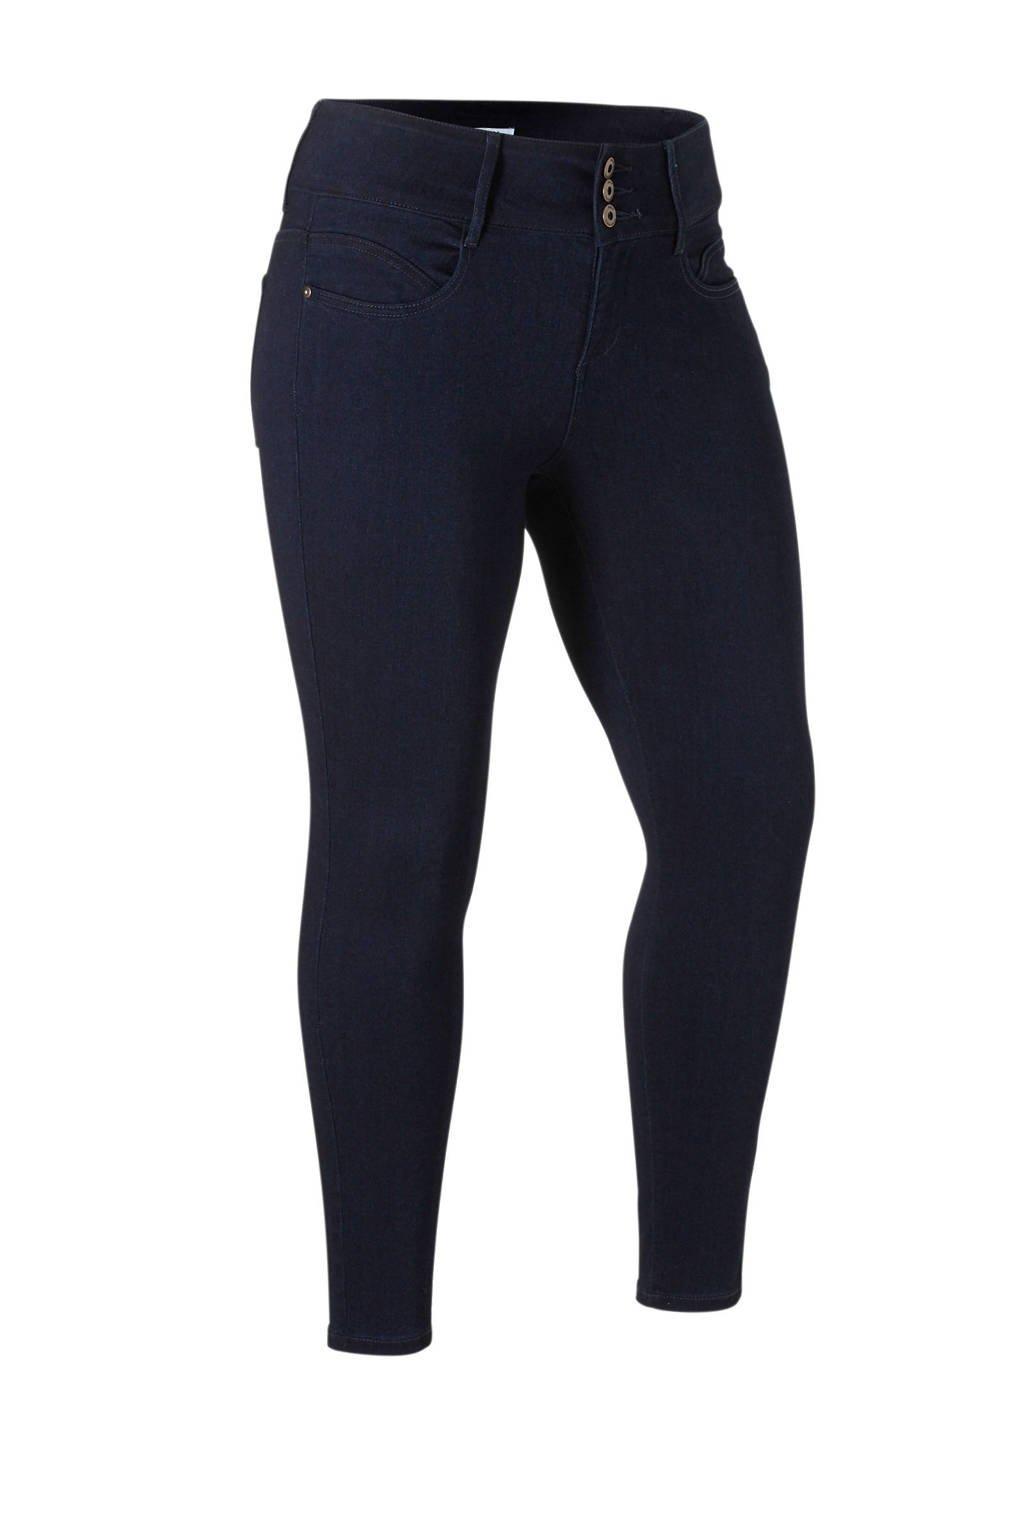 ONLY carmakoma high waist jeans, Dark denim